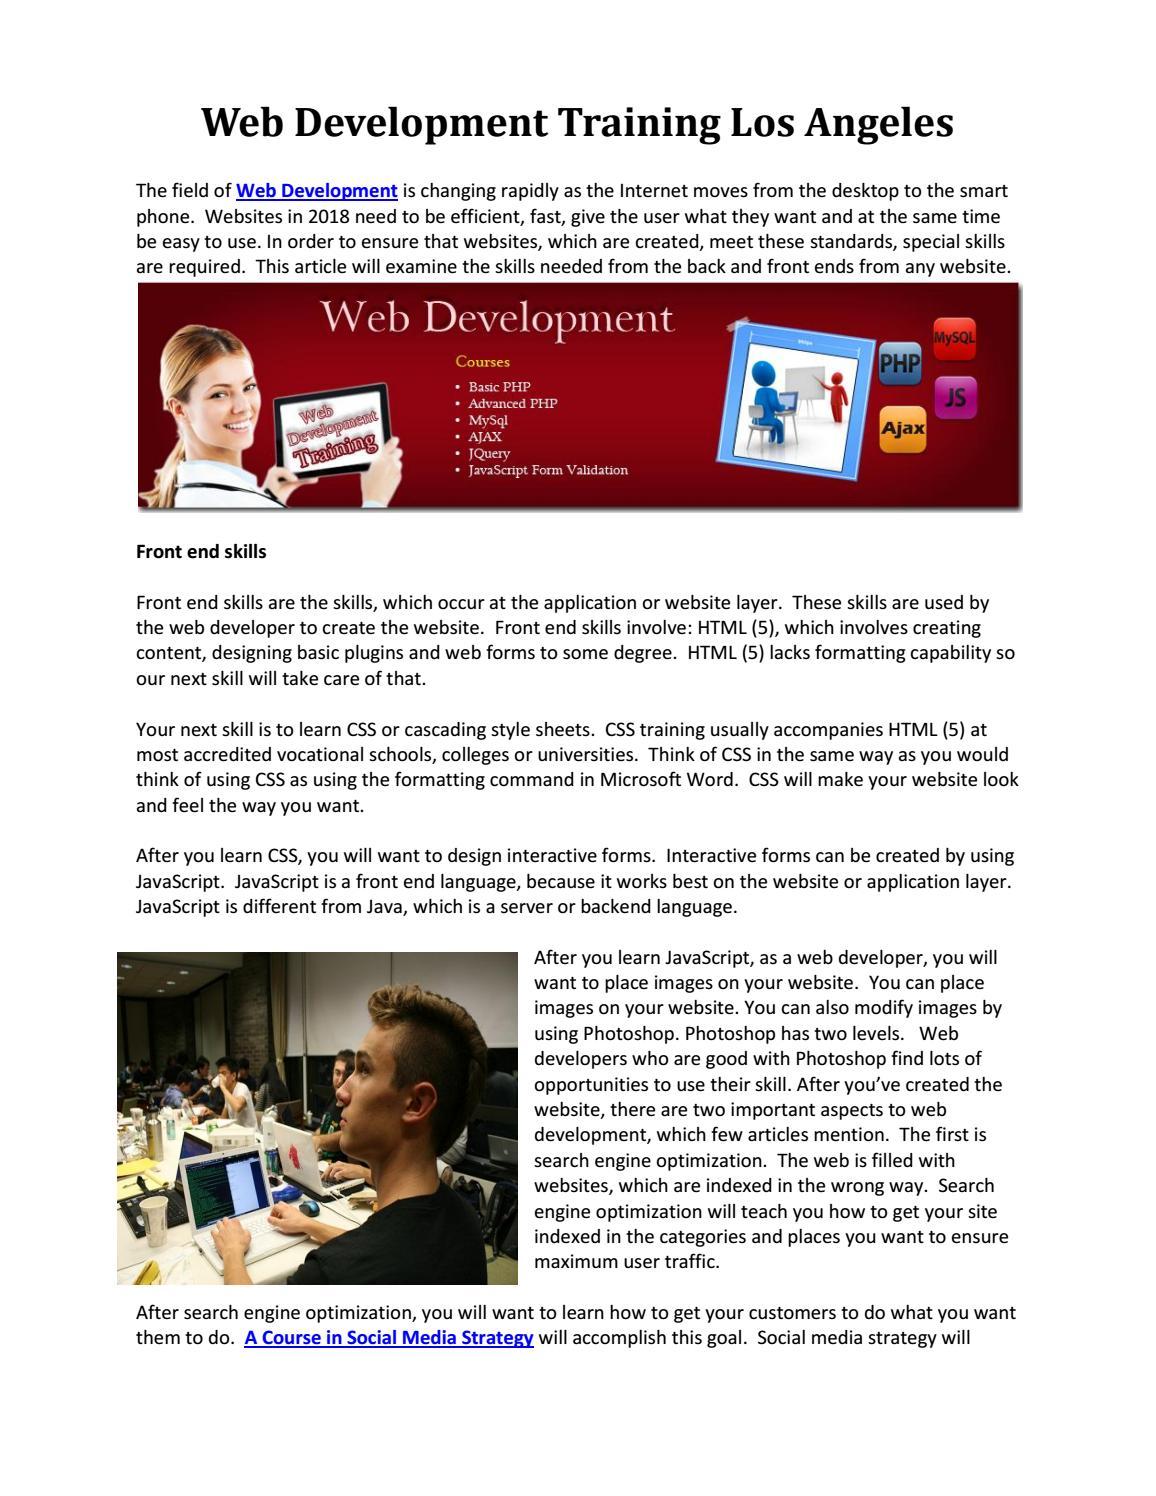 Web Development Training Los Angeles By Computer Training Los Angeles Issuu